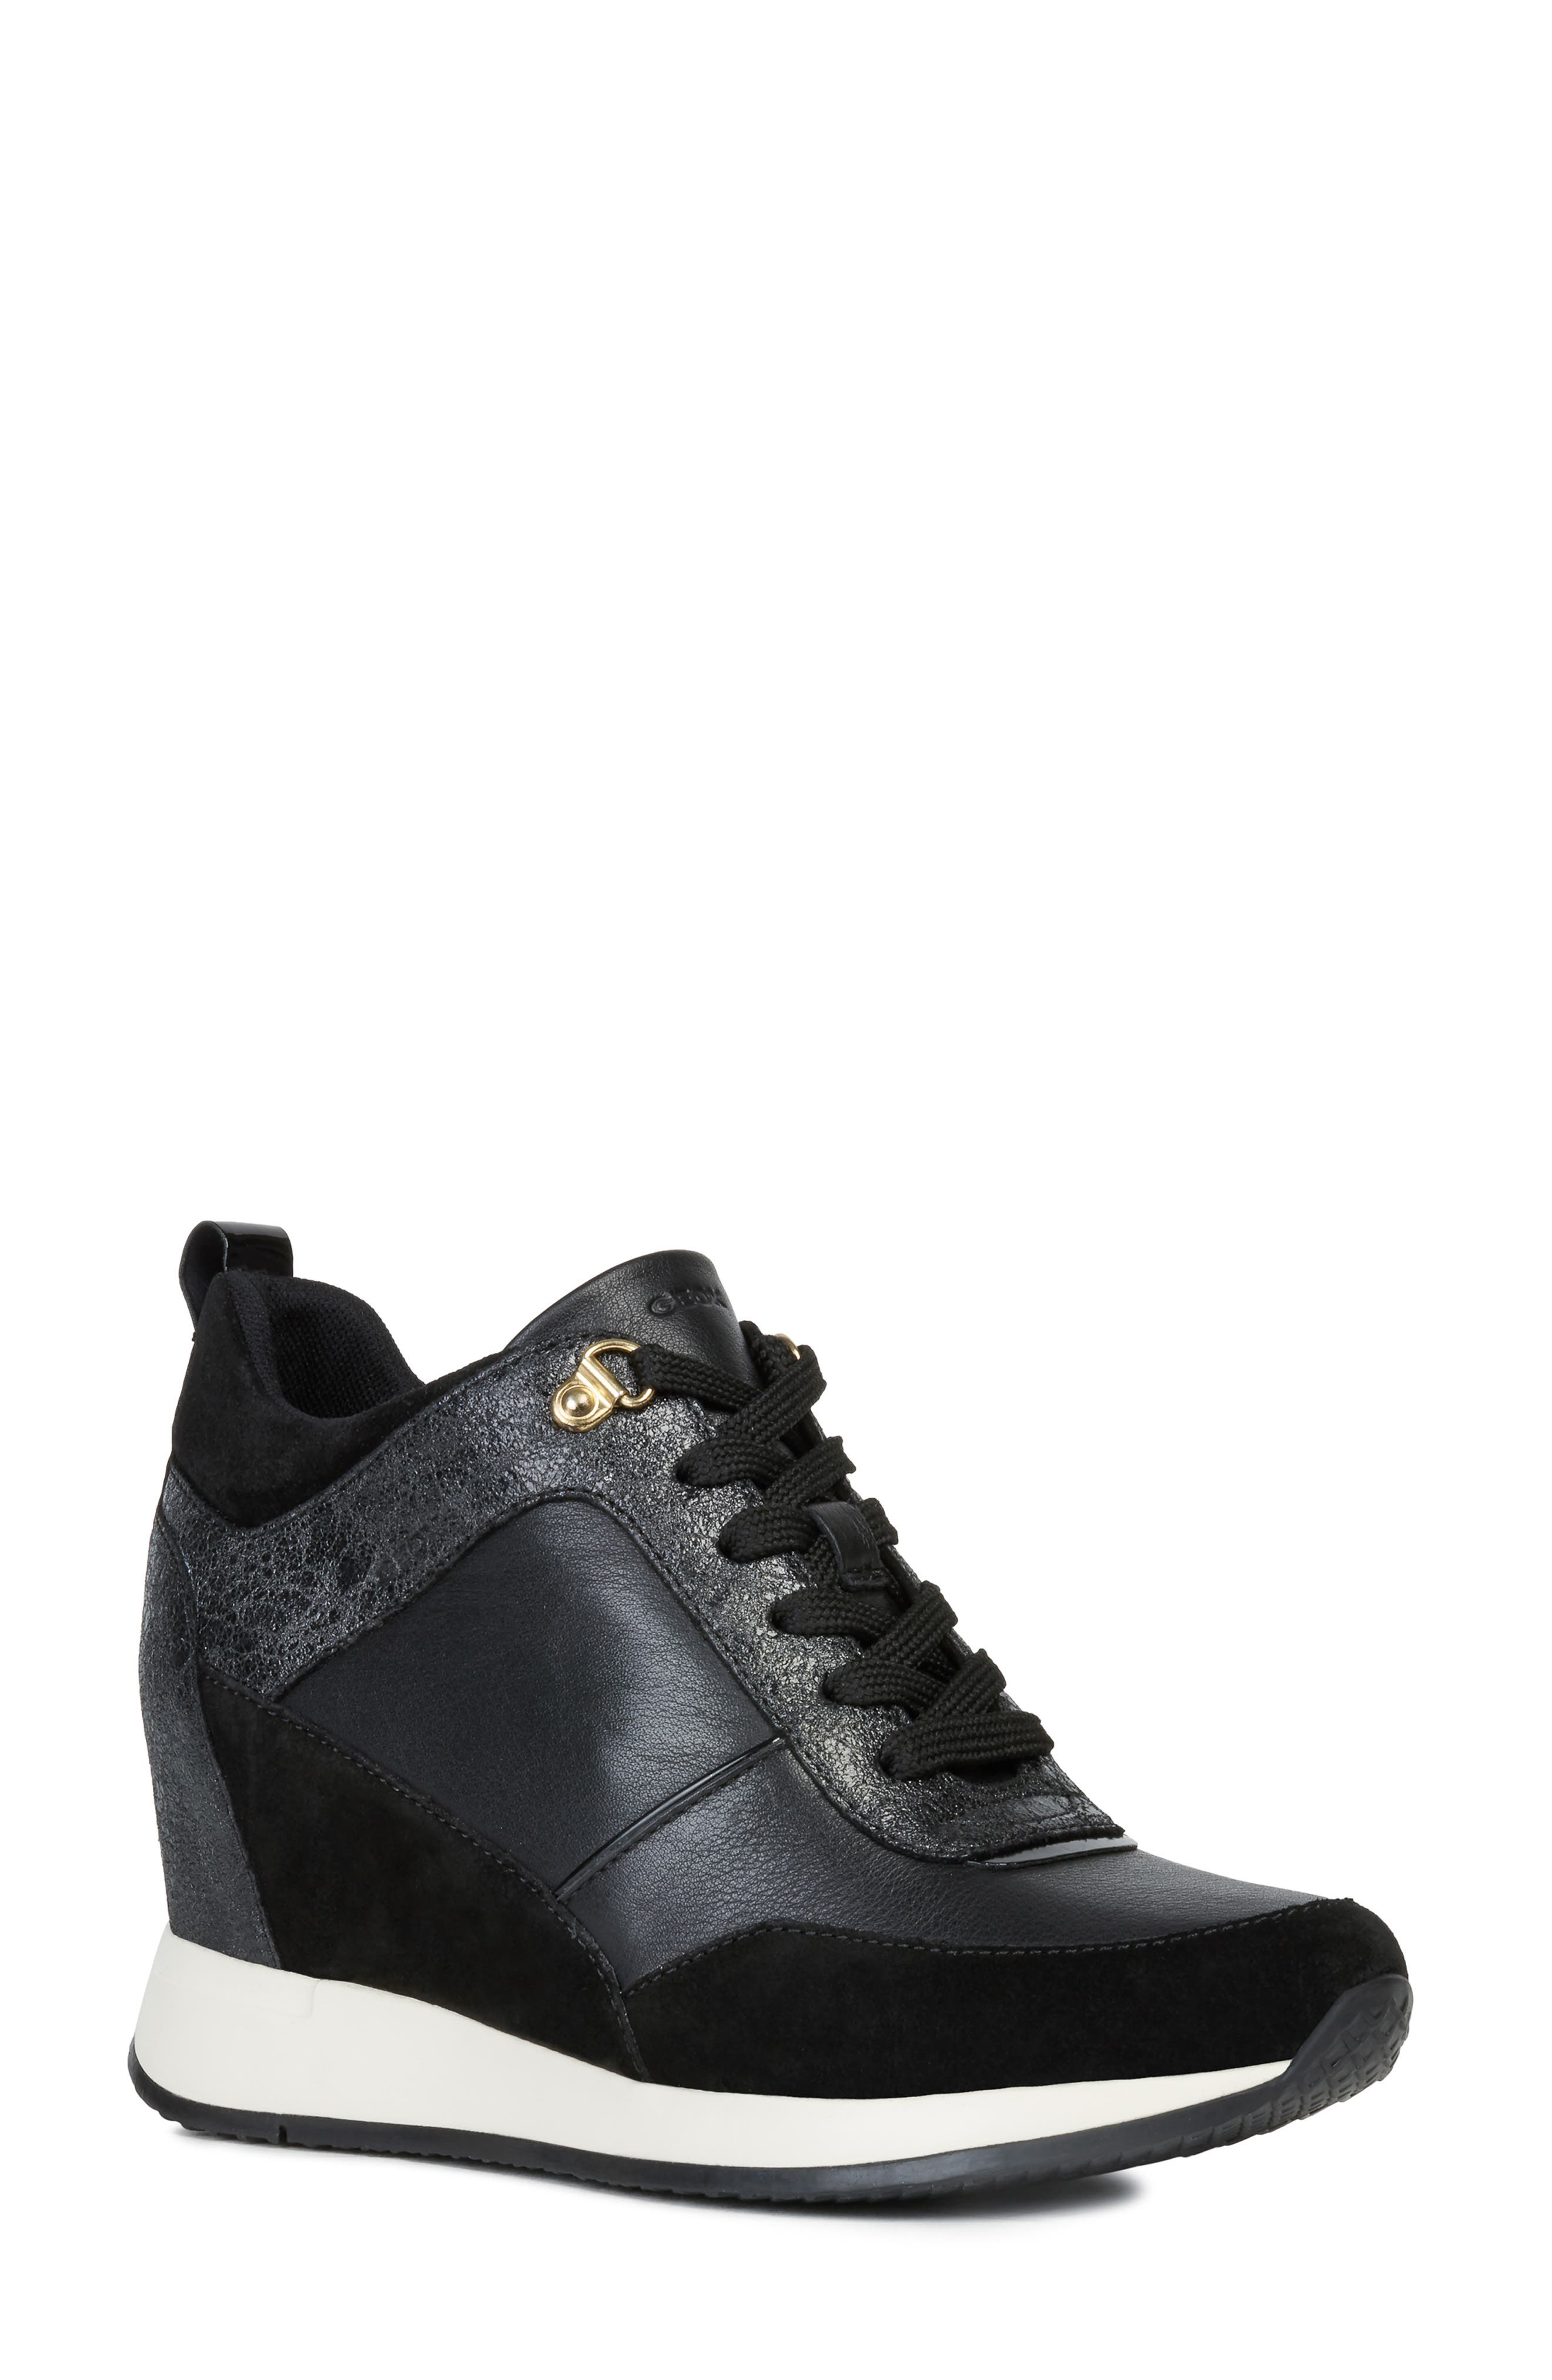 buy geox shoes online USA, Geox myria trainers skin women